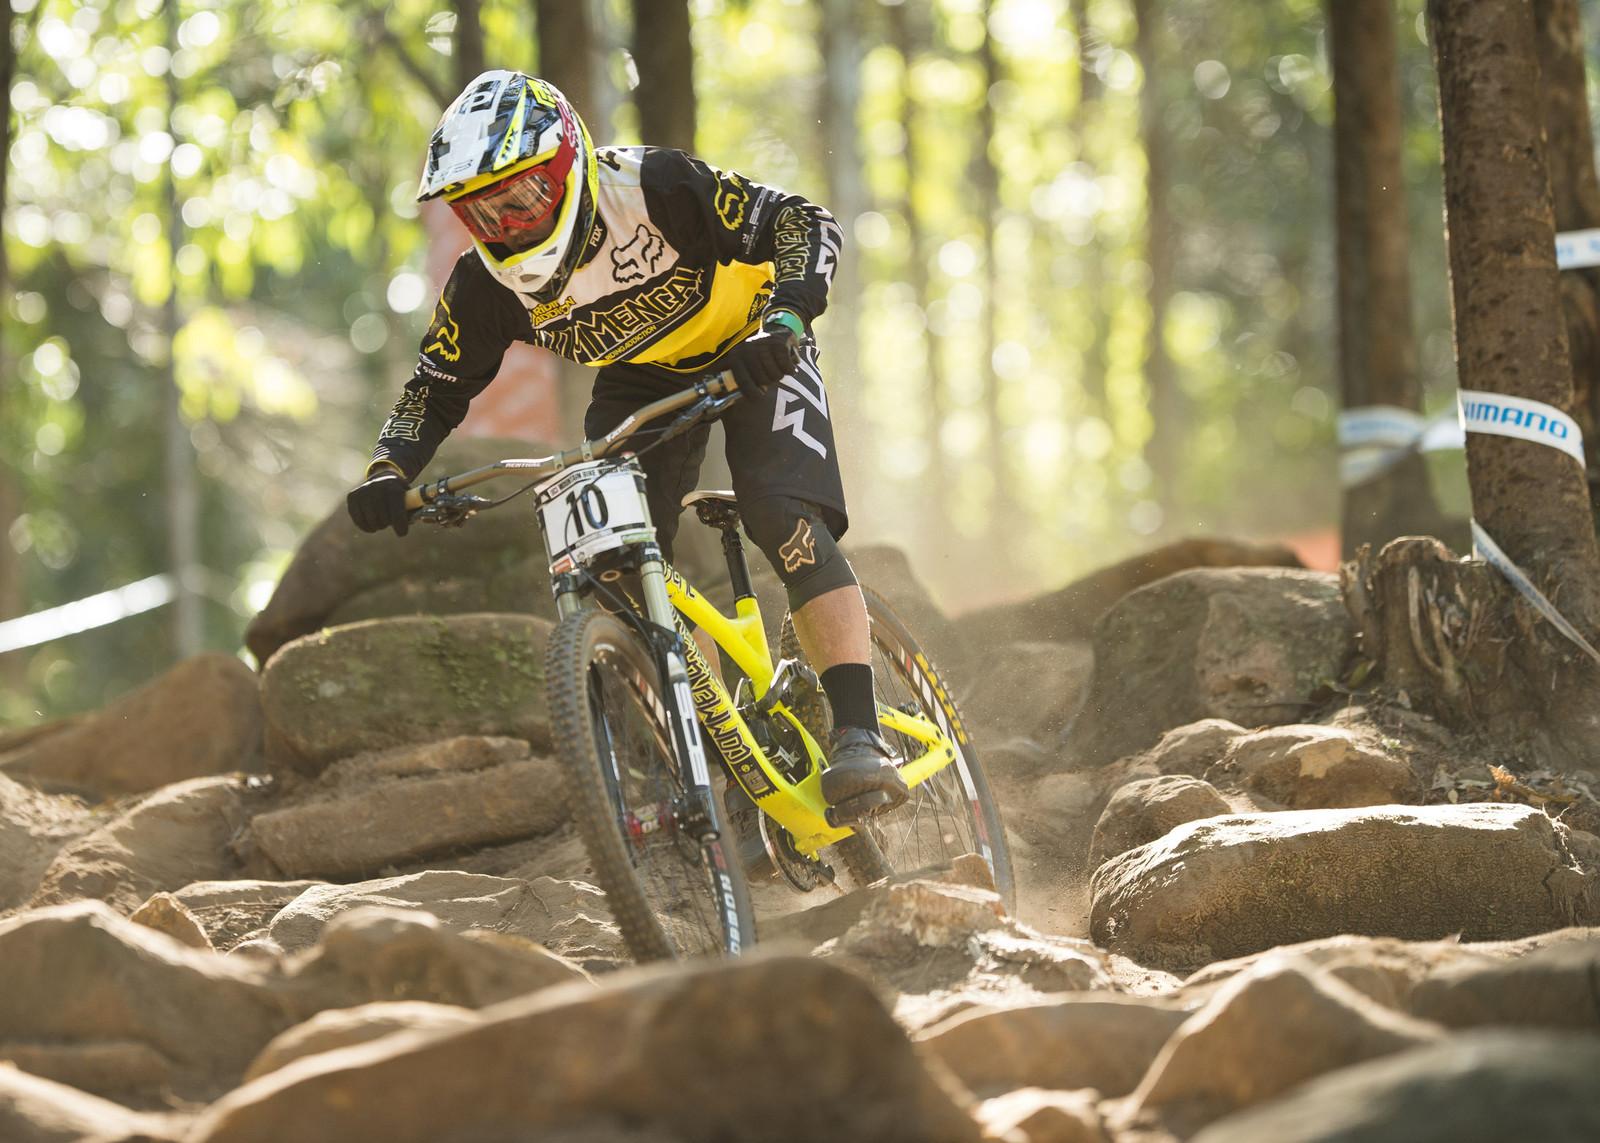 Commencal Riding Addiction, Pietermaritzburg World Cup - Commencal Riding Addiction World Cup Photos - Mountain Biking Pictures - Vital MTB